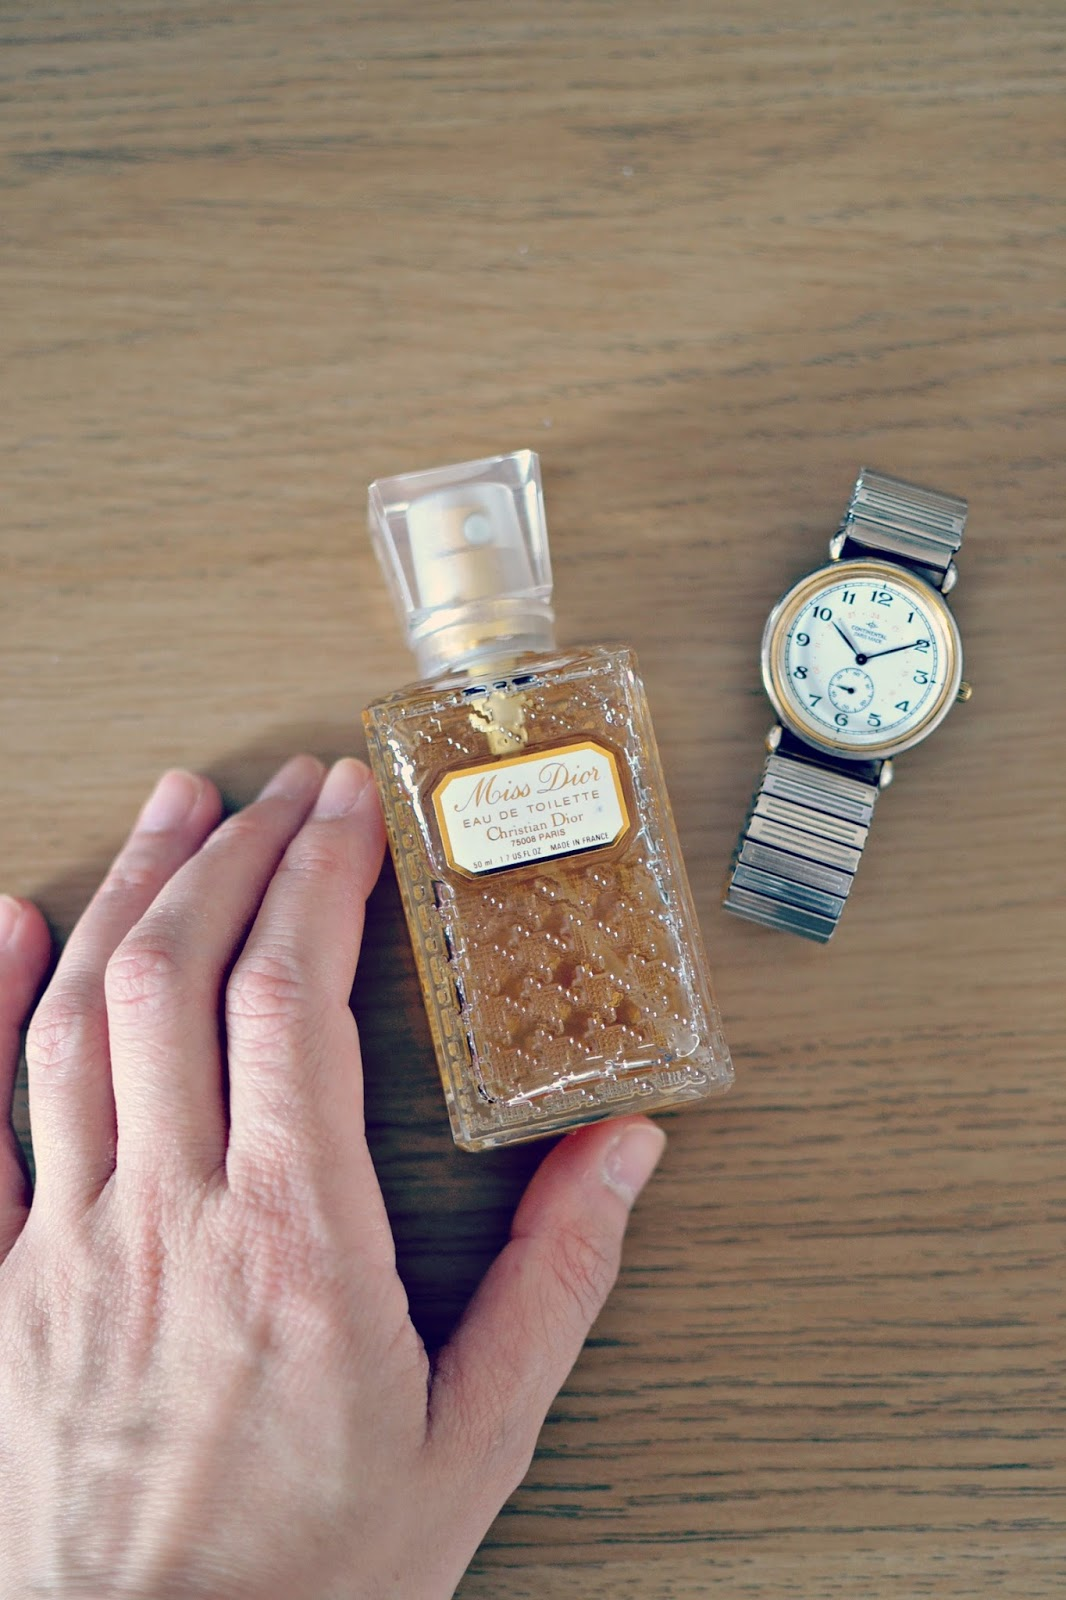 Miss Dior vintage perfume